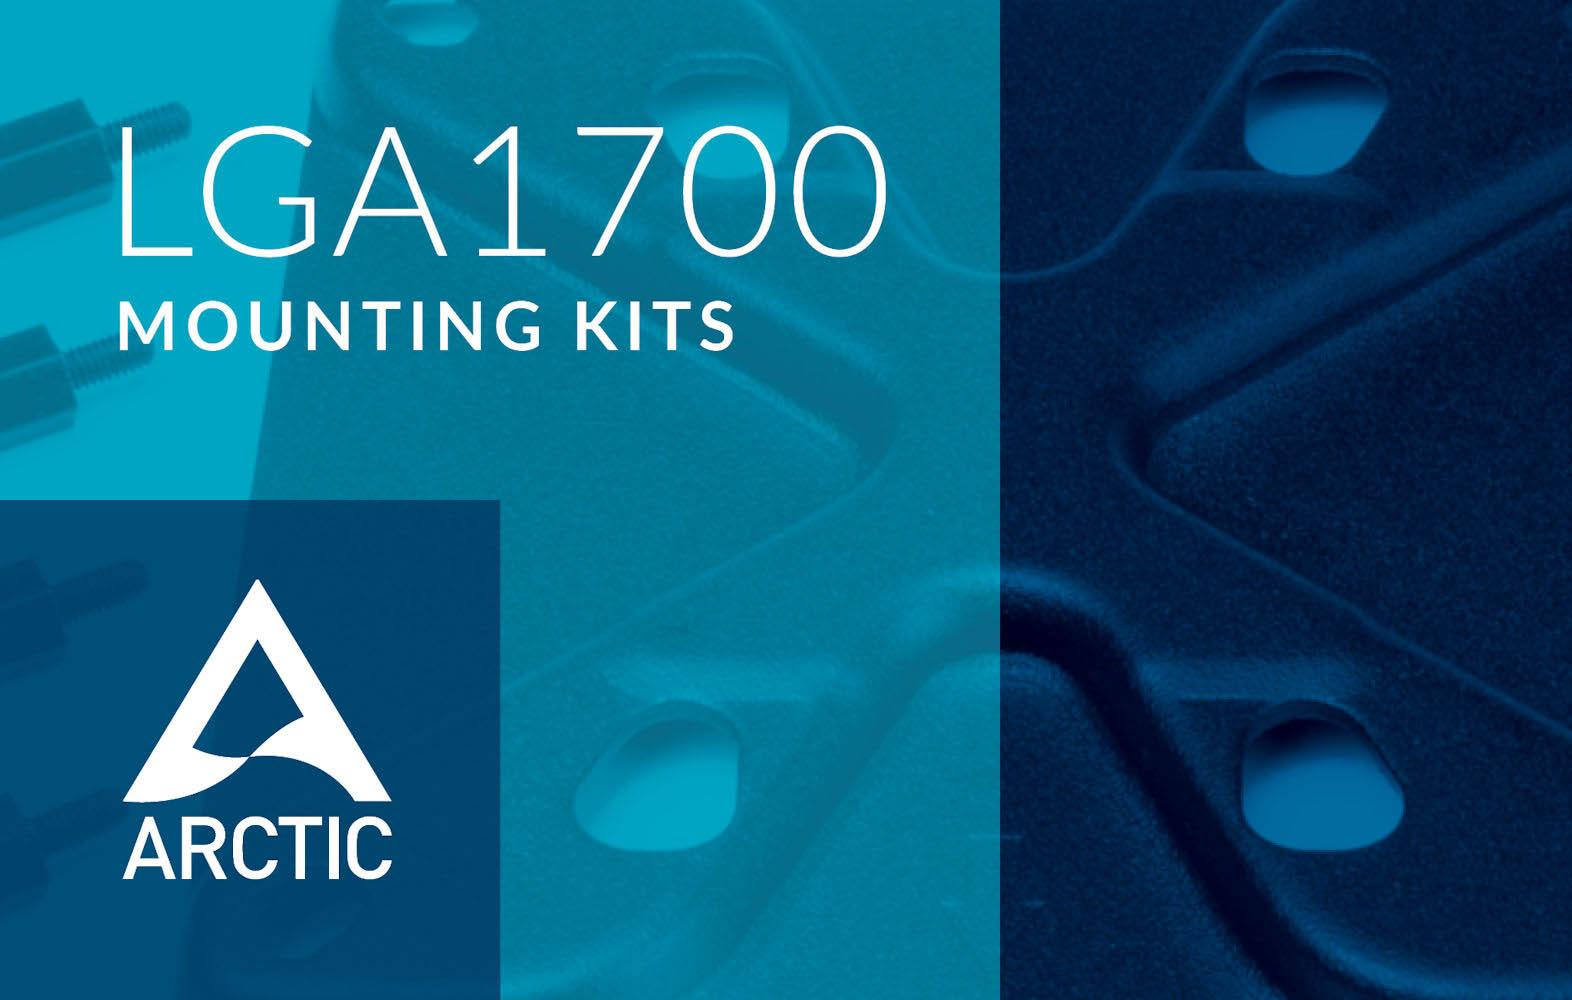 Los kits de montaje Intel LGA1700 de Arctic para CPU Alder Lake estarán disponibles a mediados de octubre